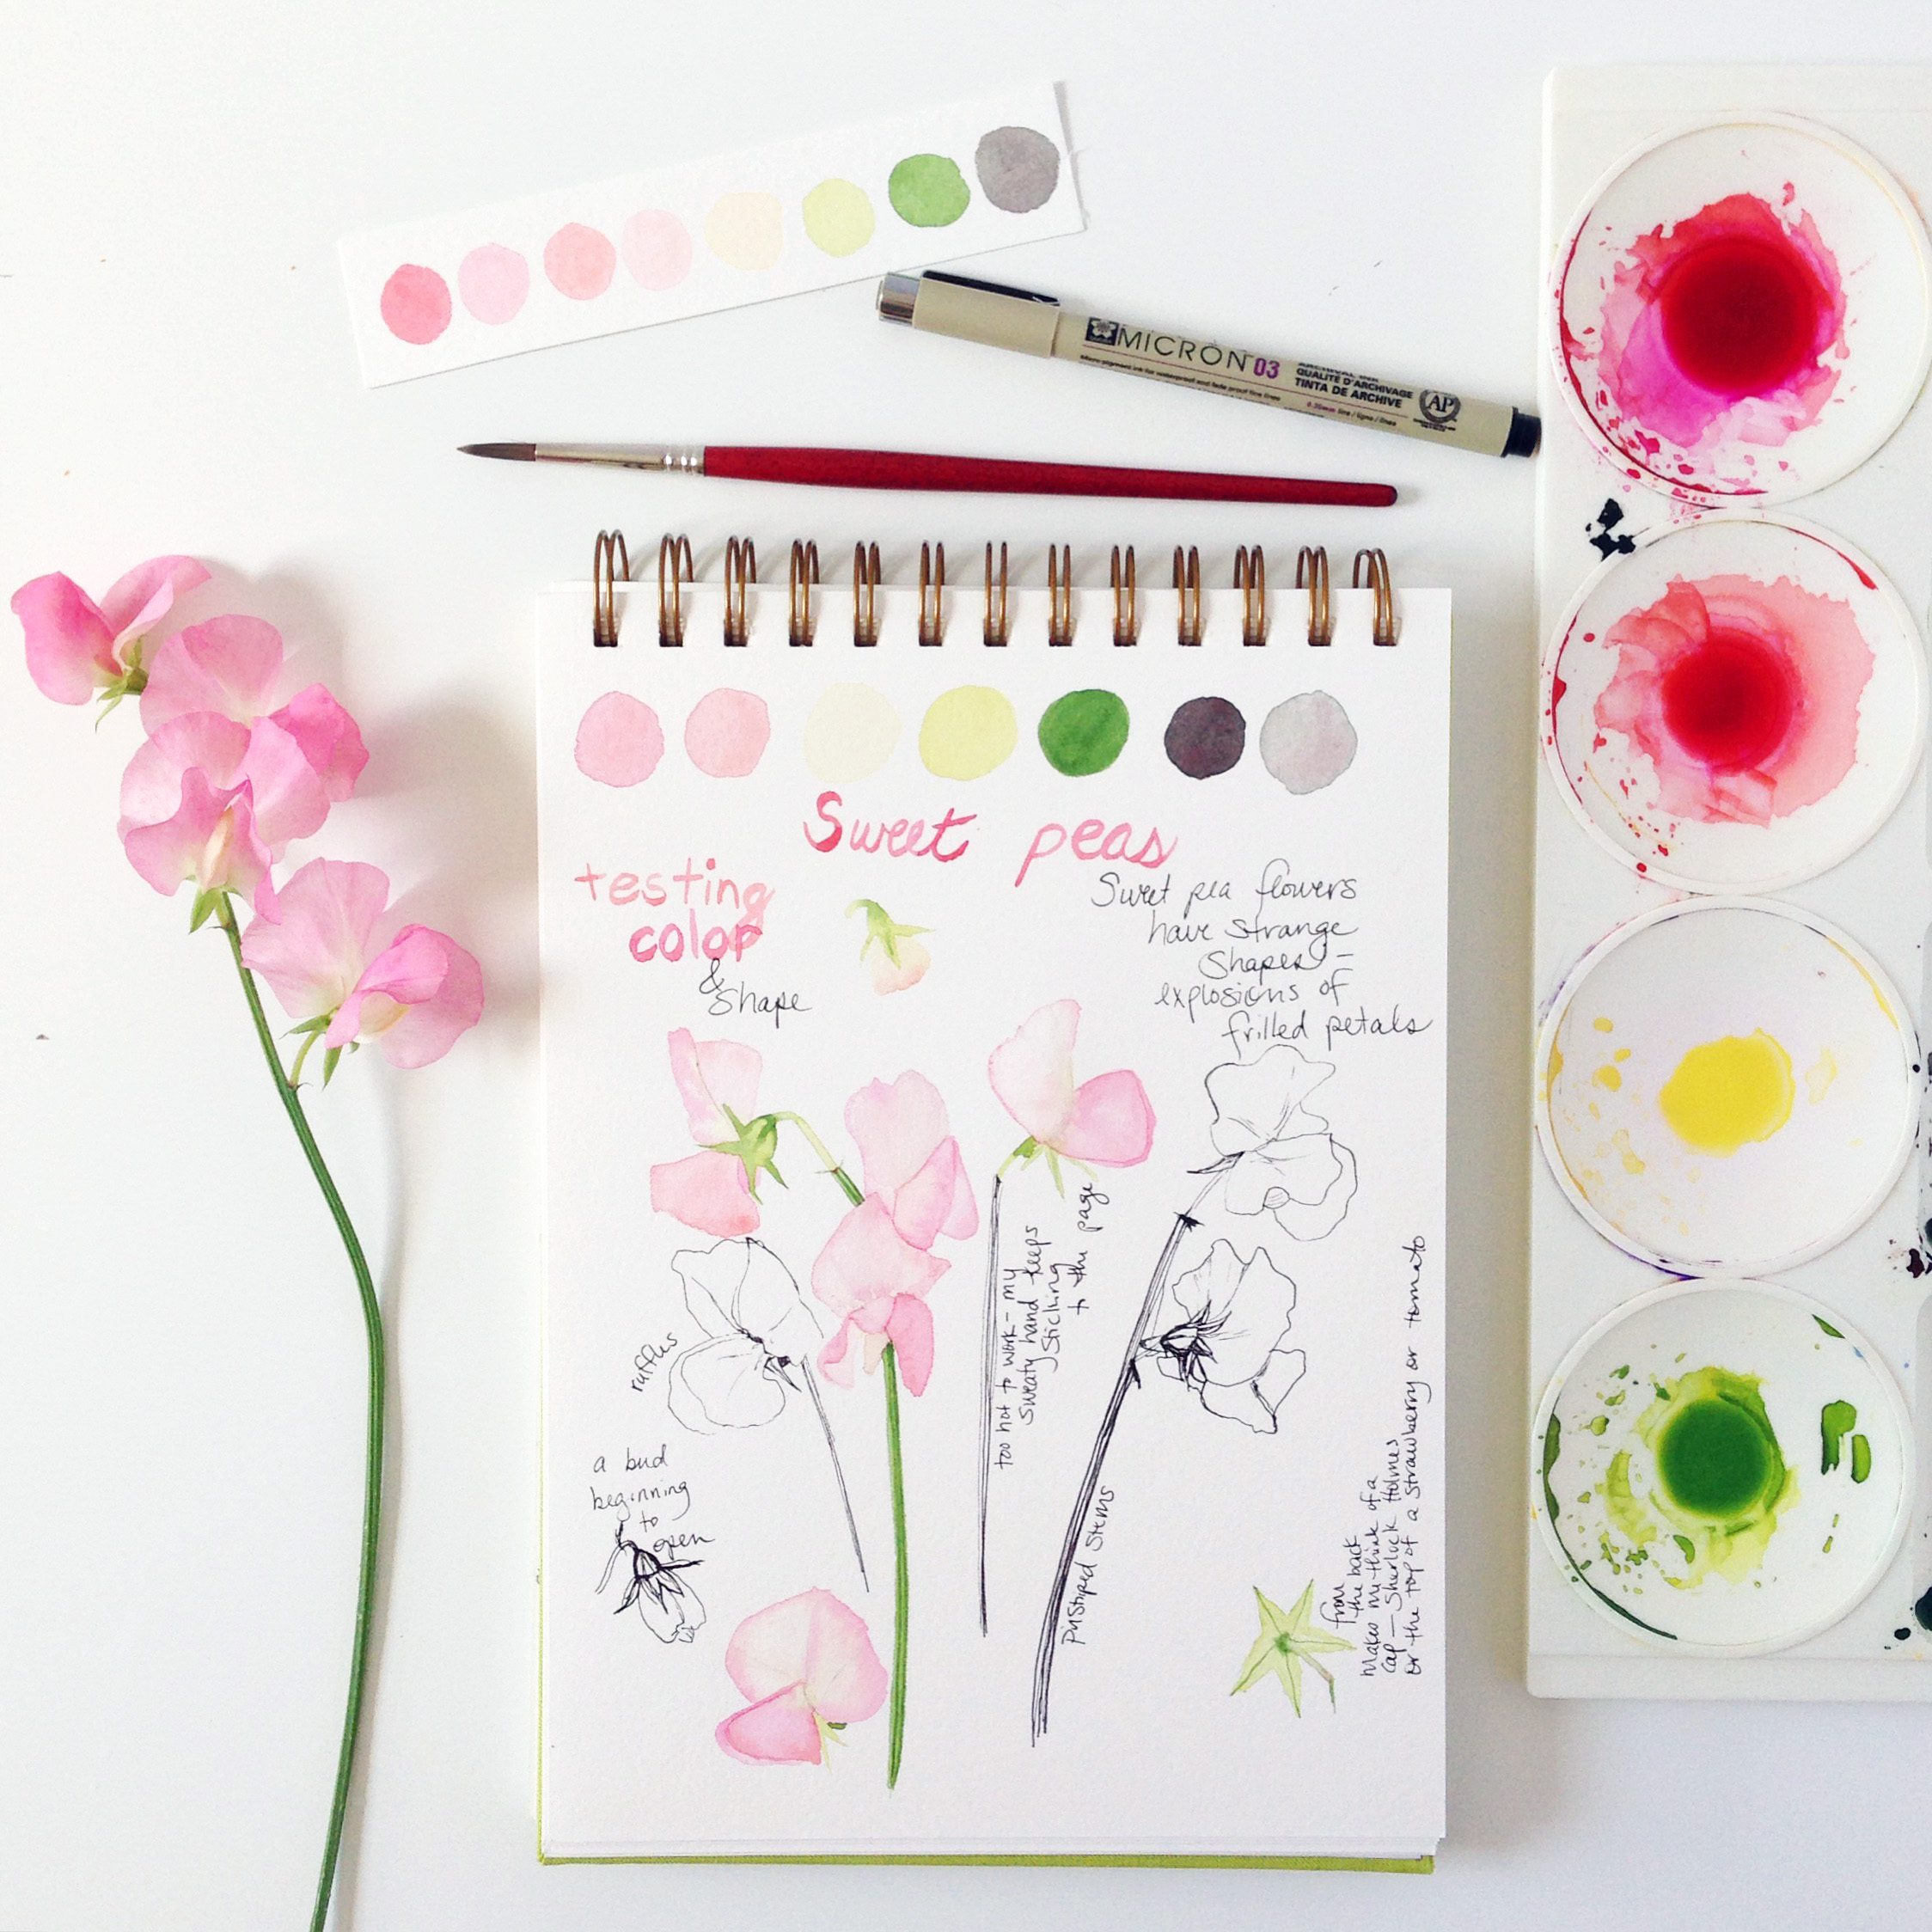 Watercolor Sweet Pea Sketches in Anne Butera's Sketchbook